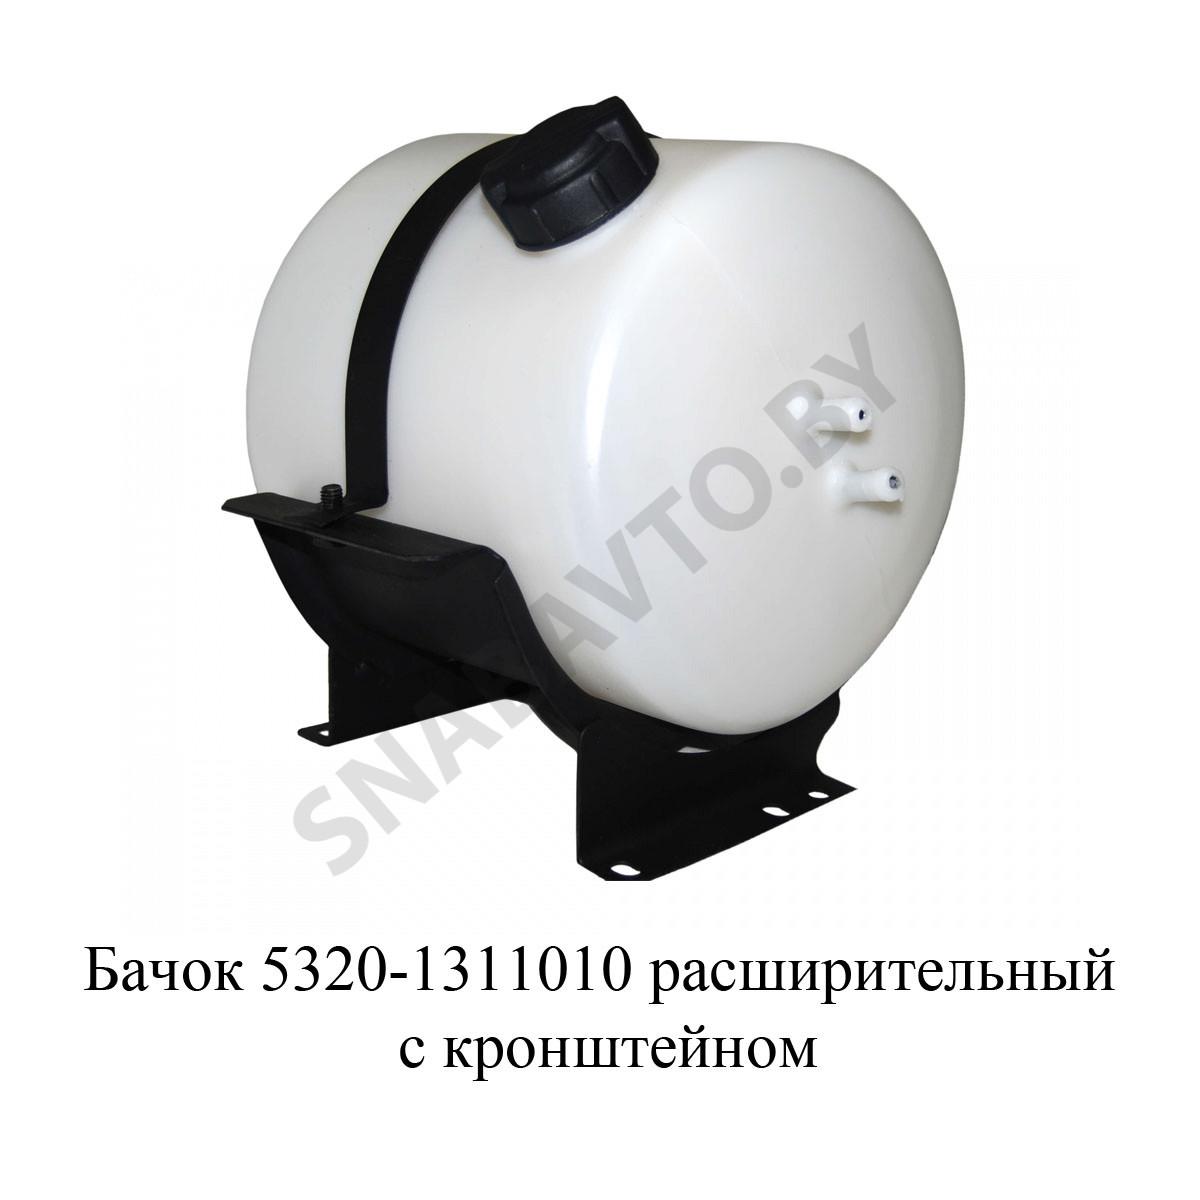 5320-1311010